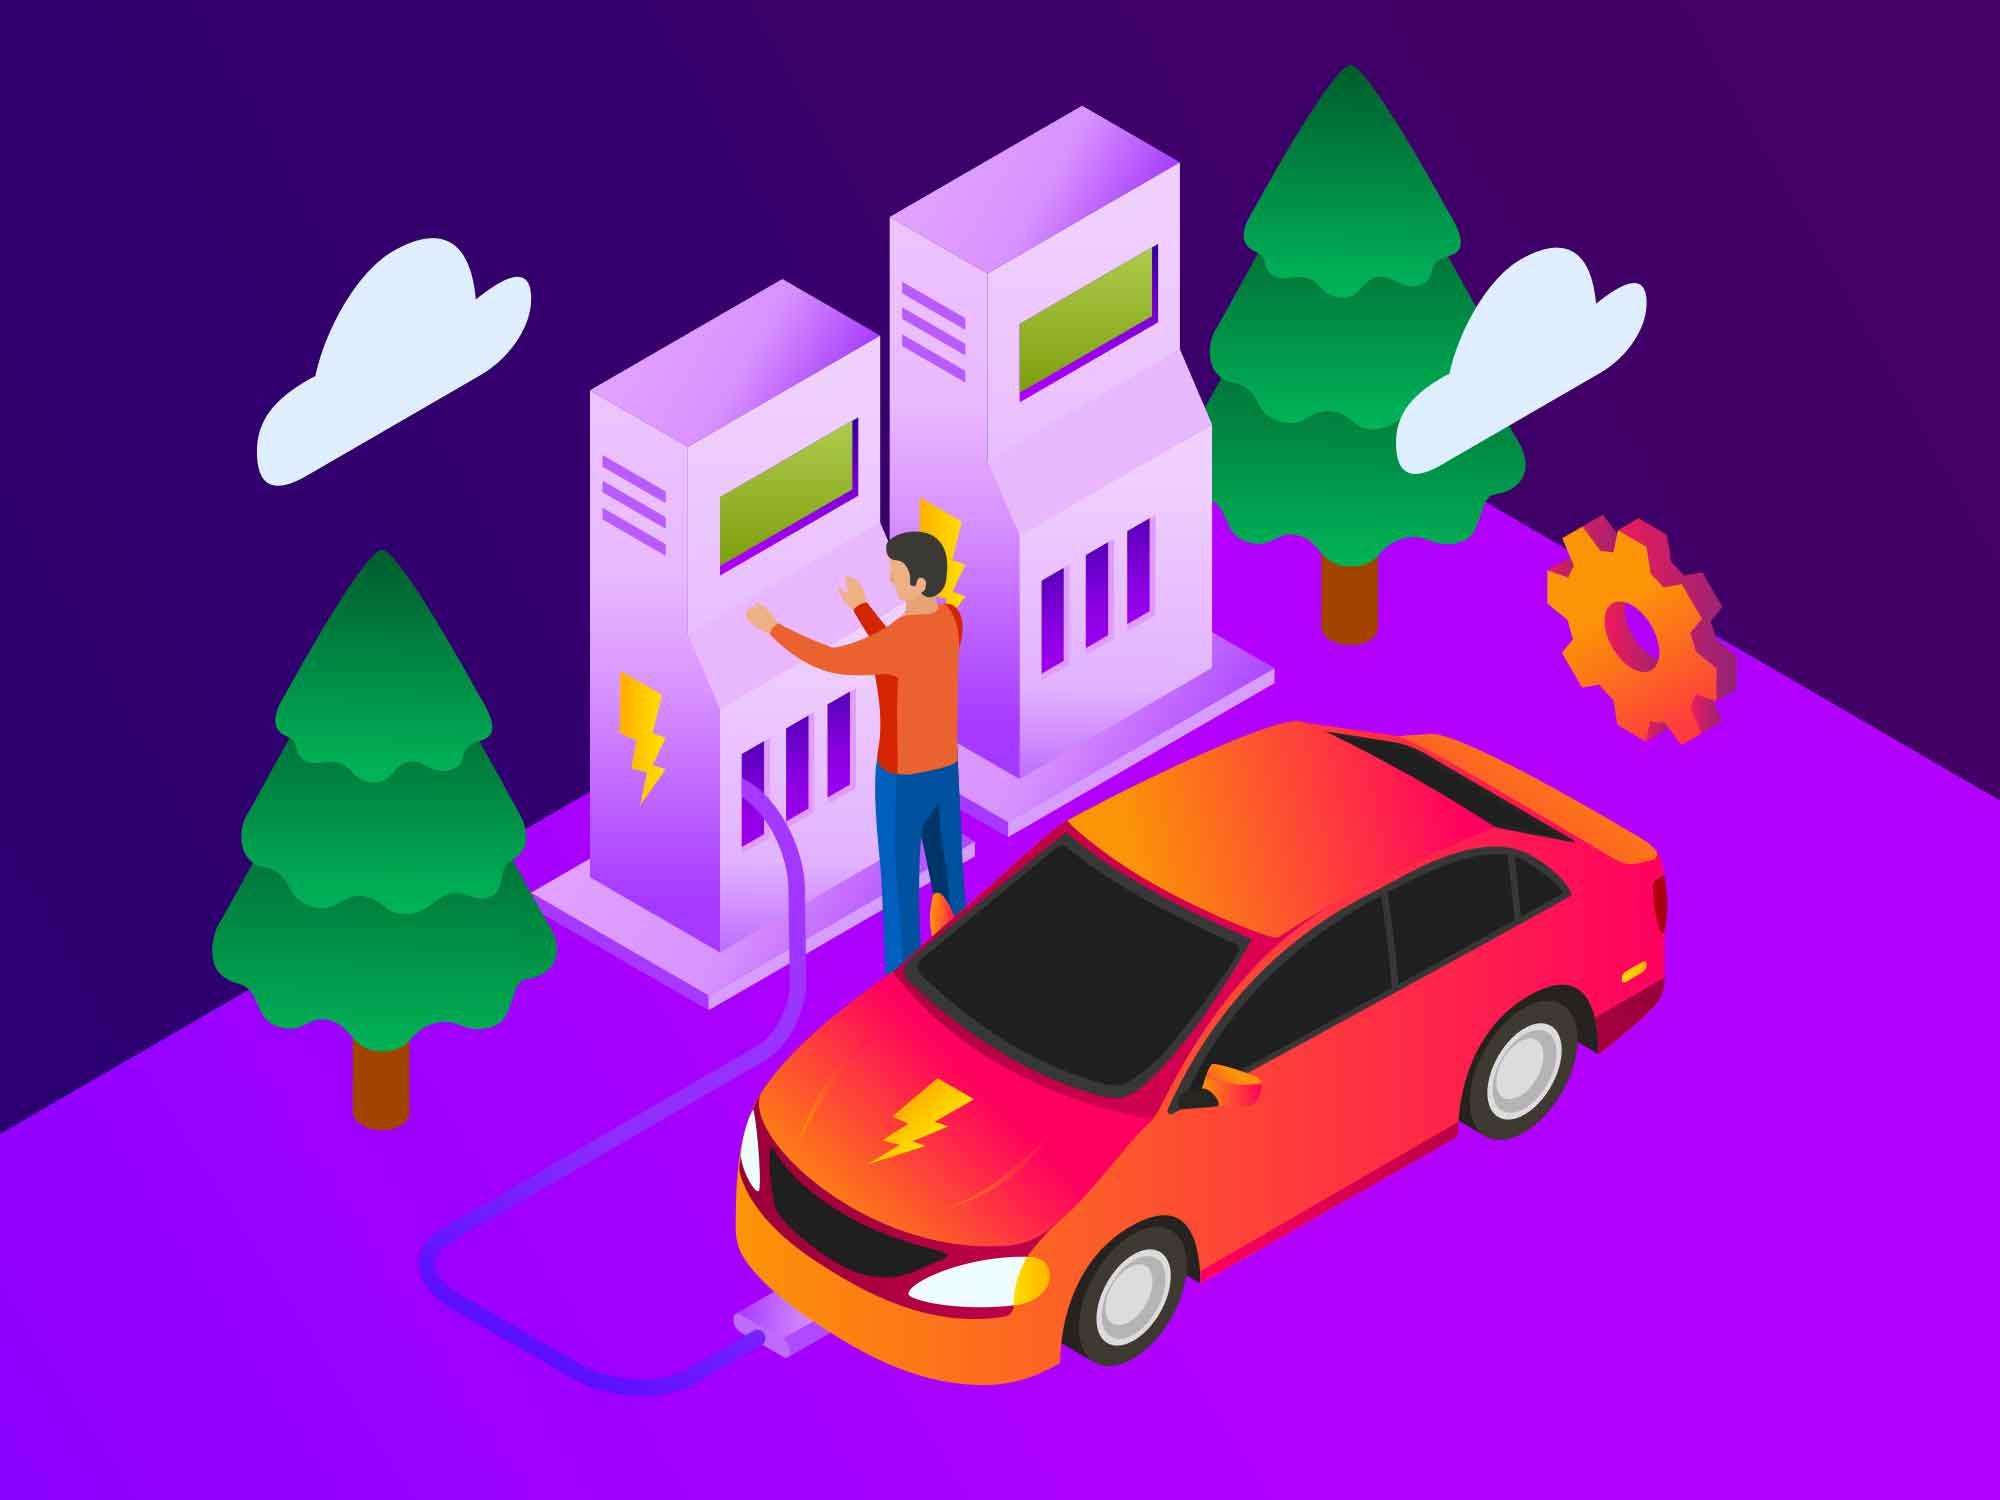 Electric Car Illustration 2